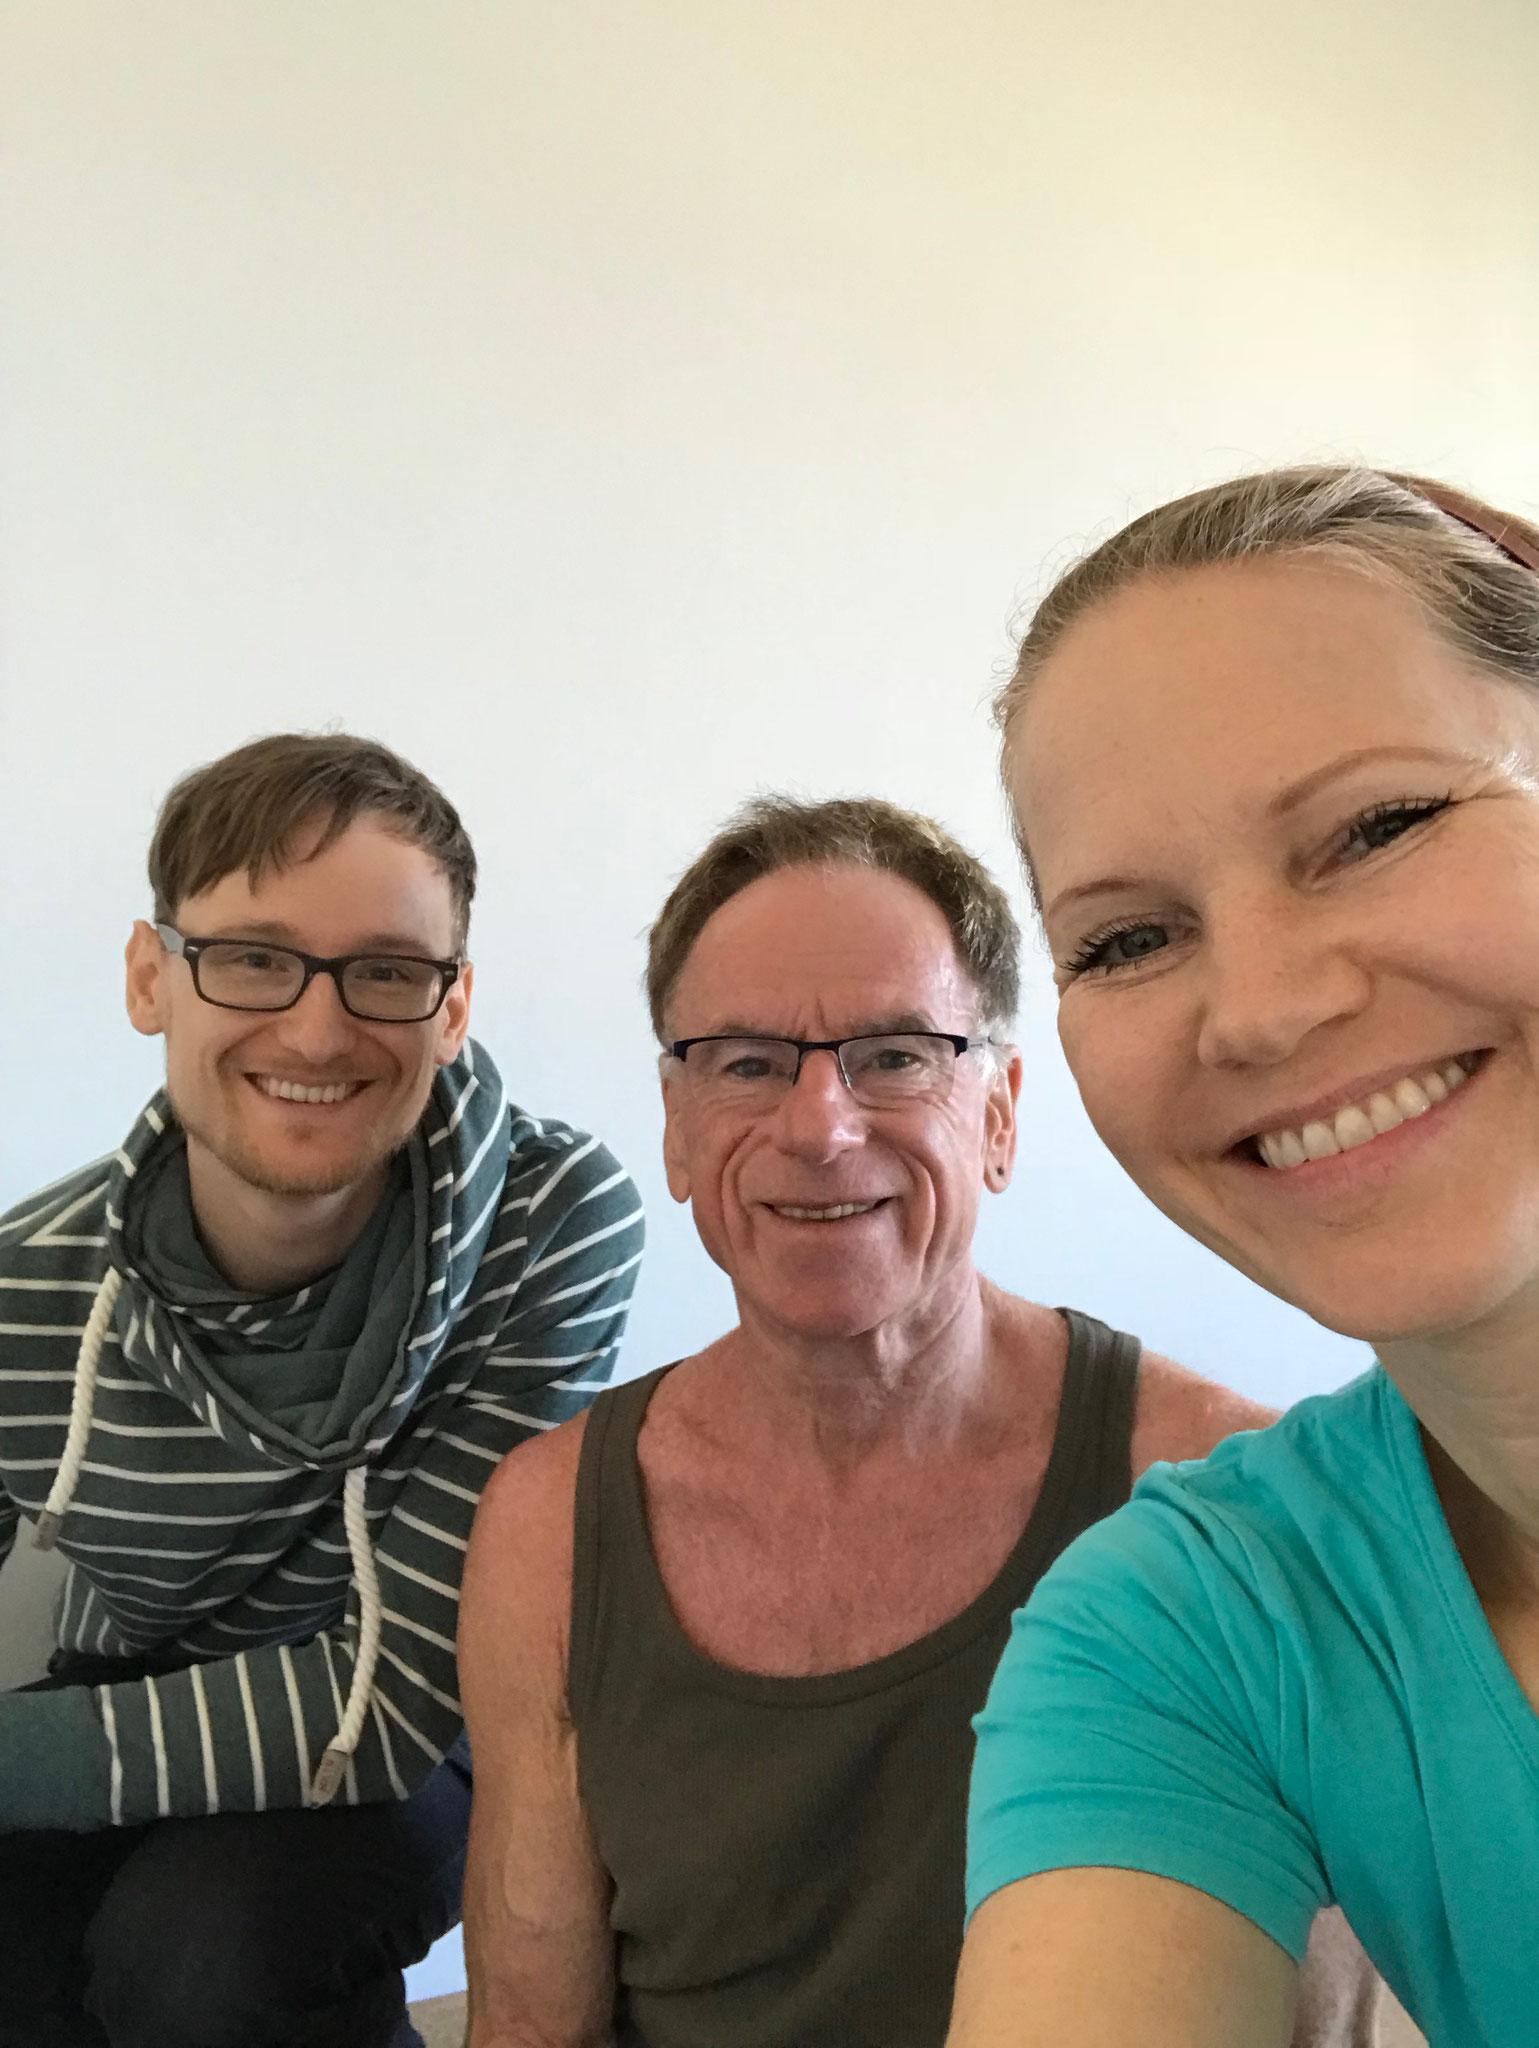 Vor dem Yoga ist nach dem Yoga - Yoga mit Klang - Carlos Michael, Steffen Günter - Sound Diving bei Yamida - Yogaschule Lüdinghausen